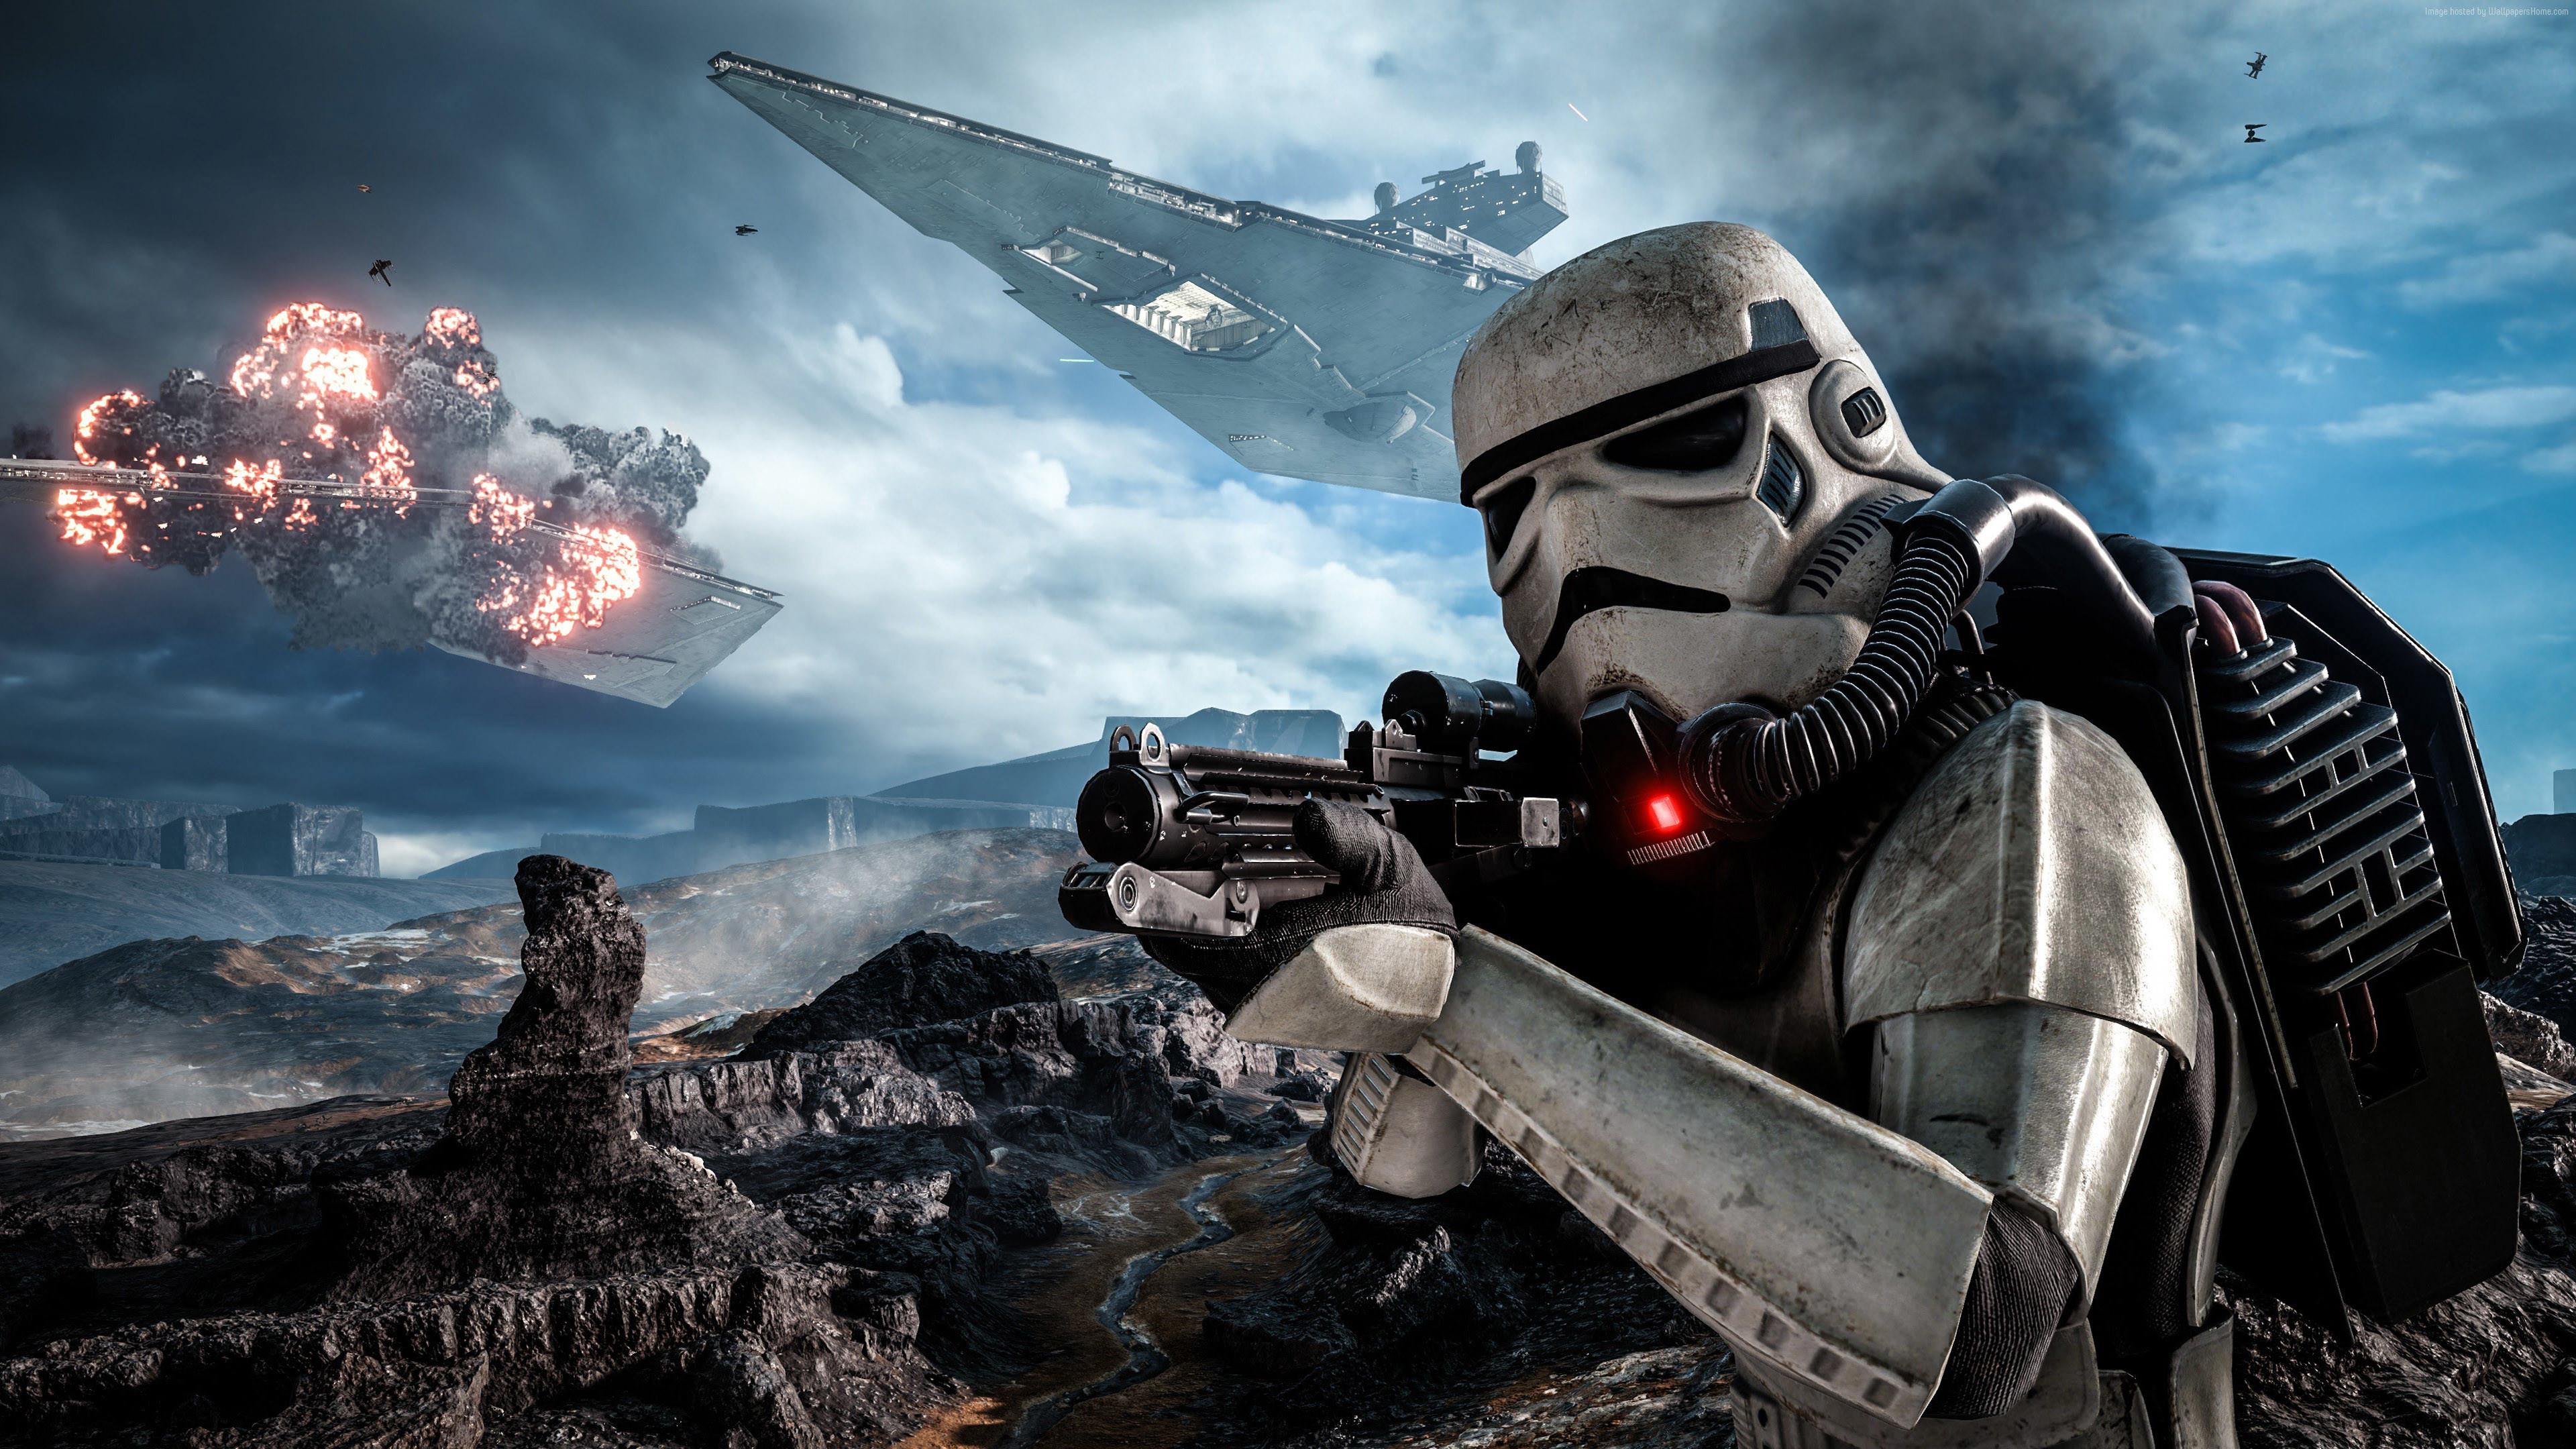 Star Wars Clone Wars Wallpaper (64+ pictures)